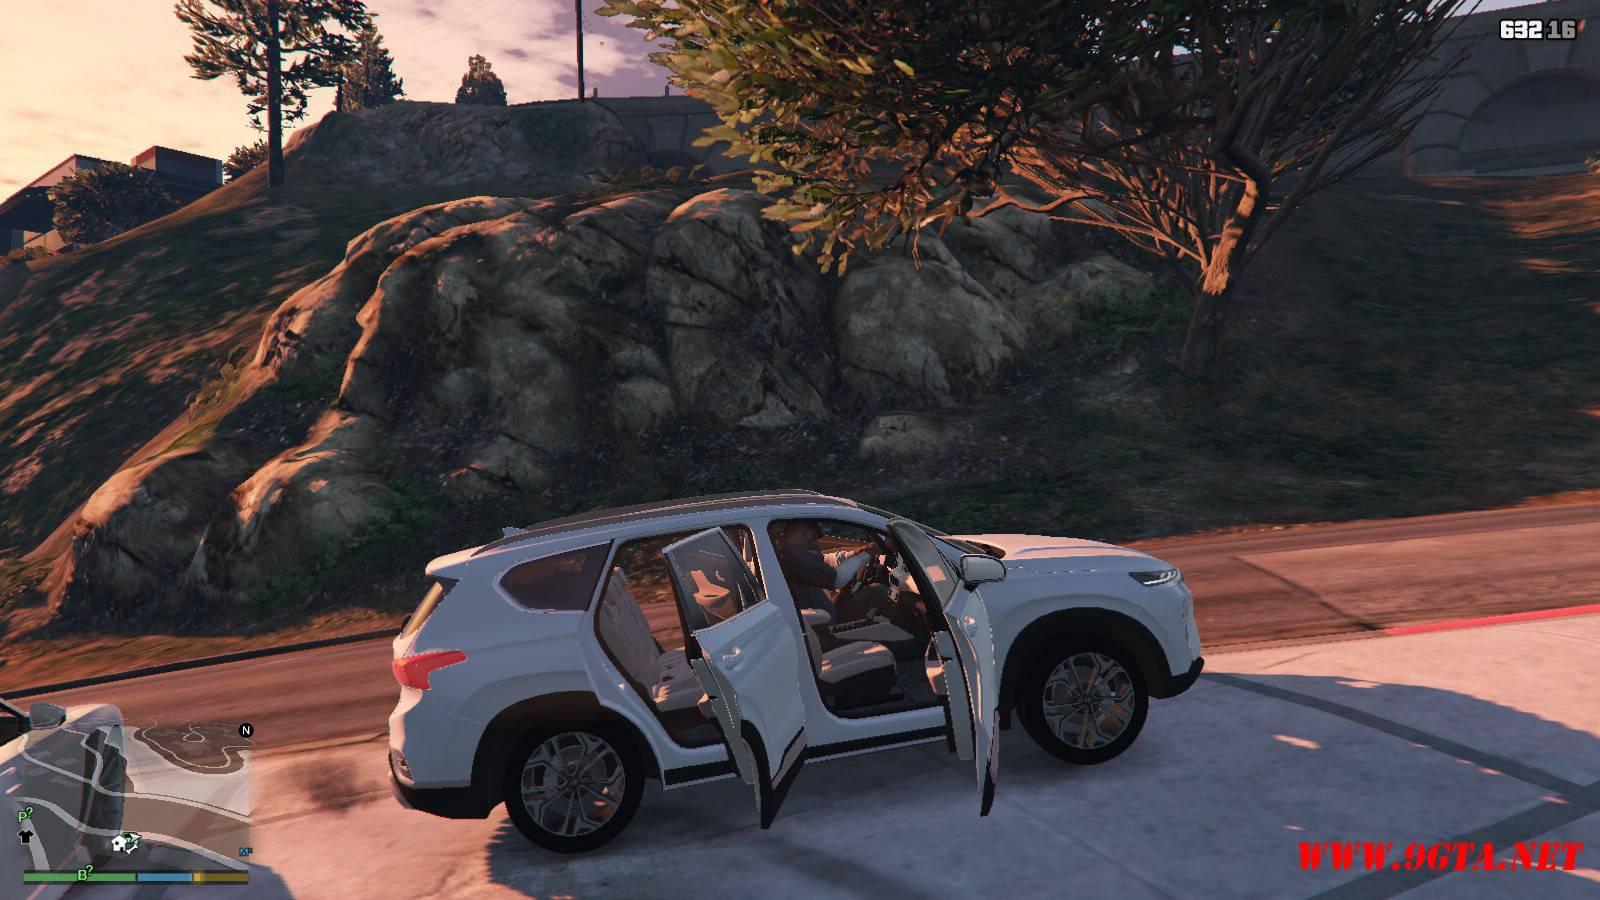 2019 Huyndai Santa Fe GTA5 mods (14)